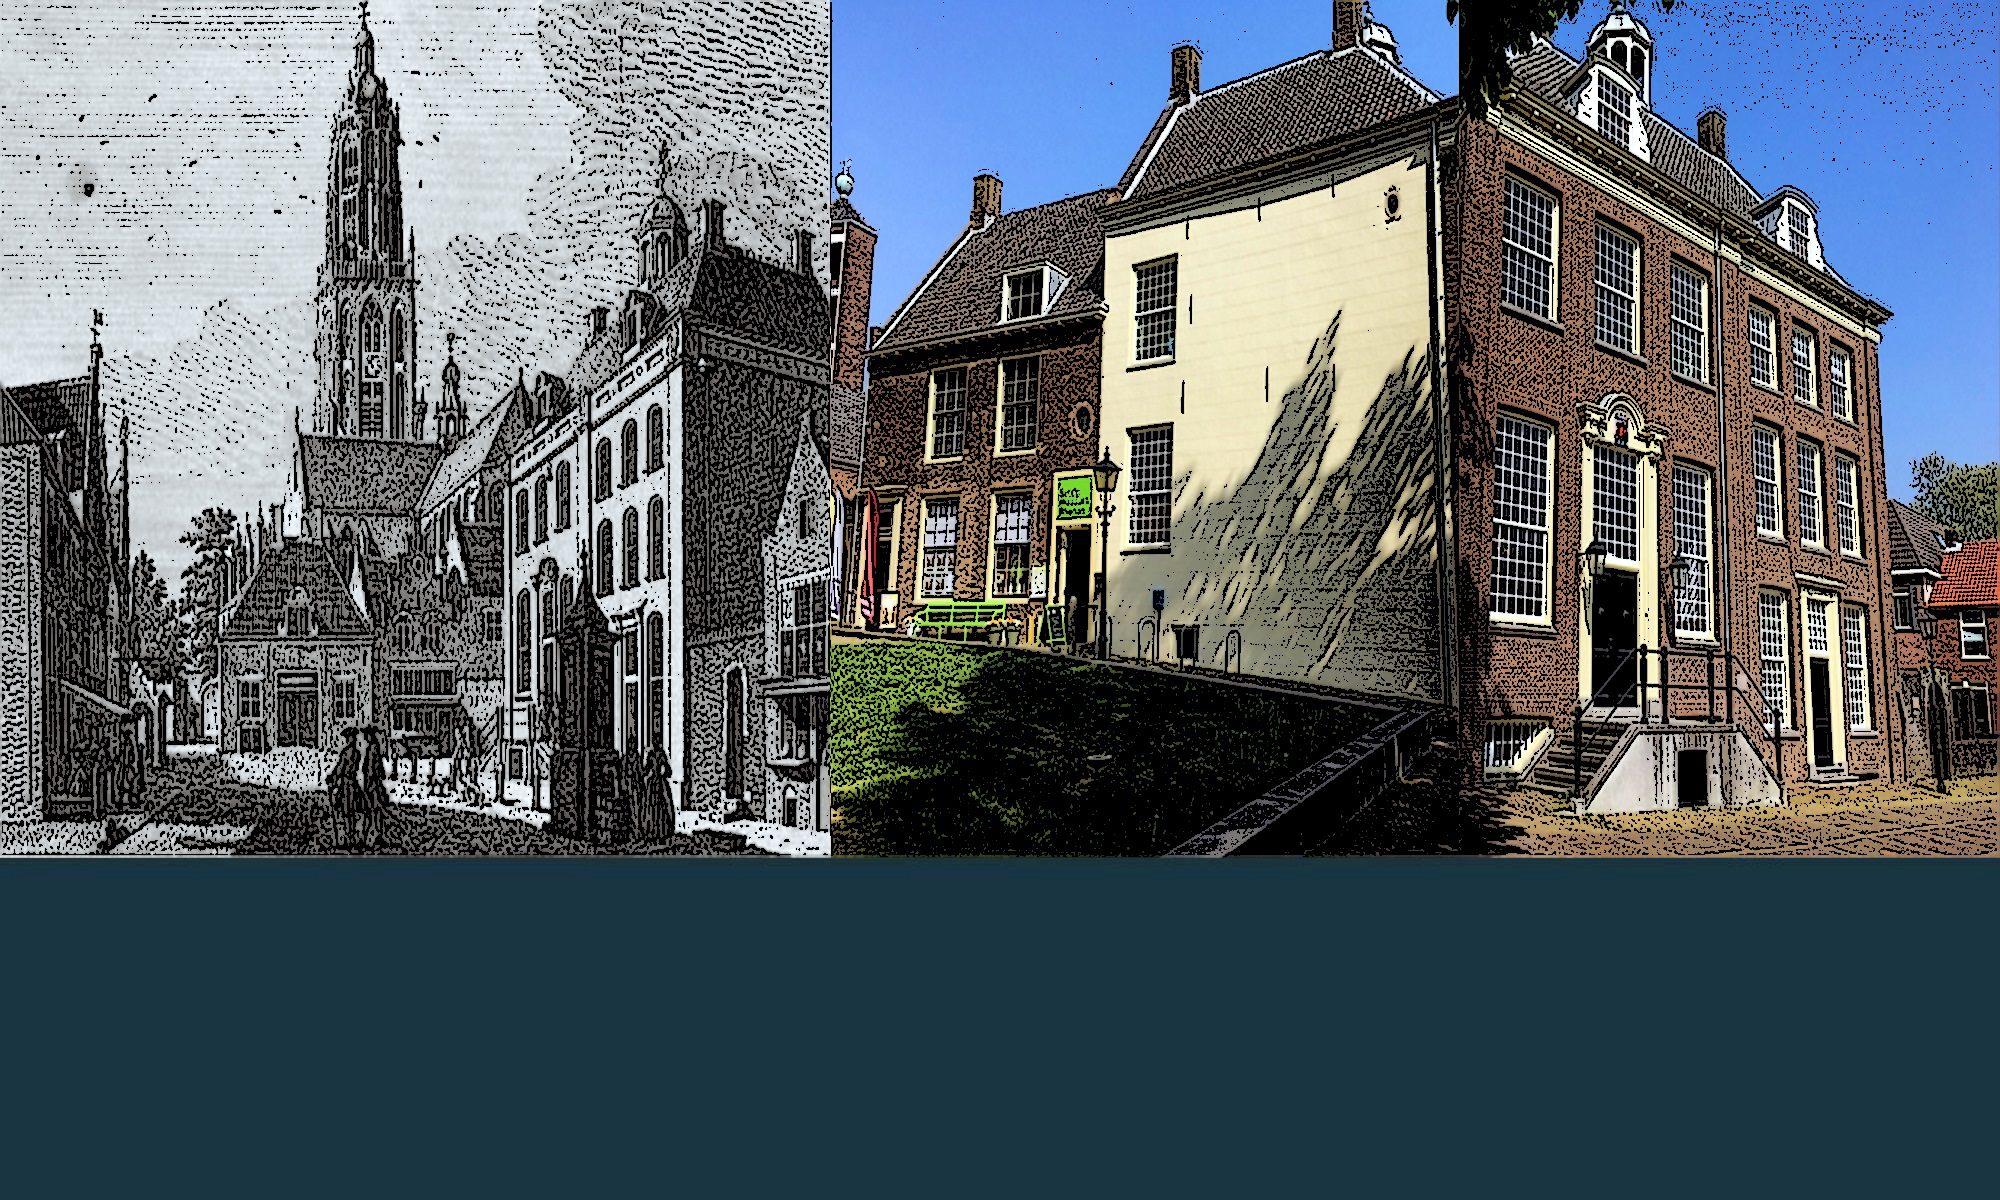 Stichting Behoud Collectie Erfgoed Rhenen